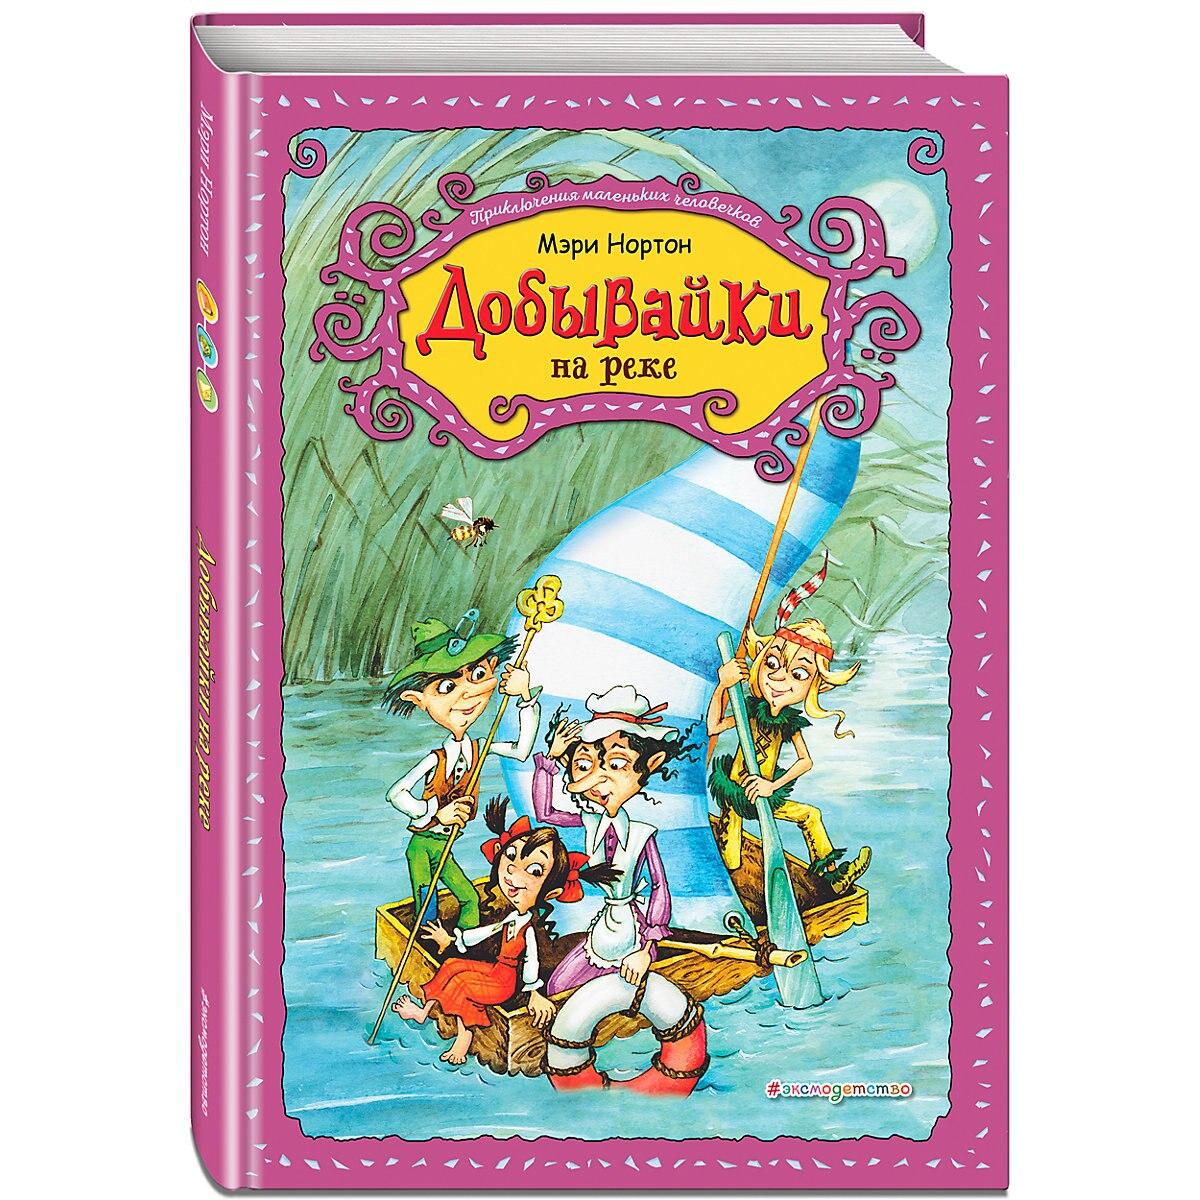 Books EKSMO 10758009 Children Education Encyclopedia Alphabet Dictionary Book For Baby MTpromo